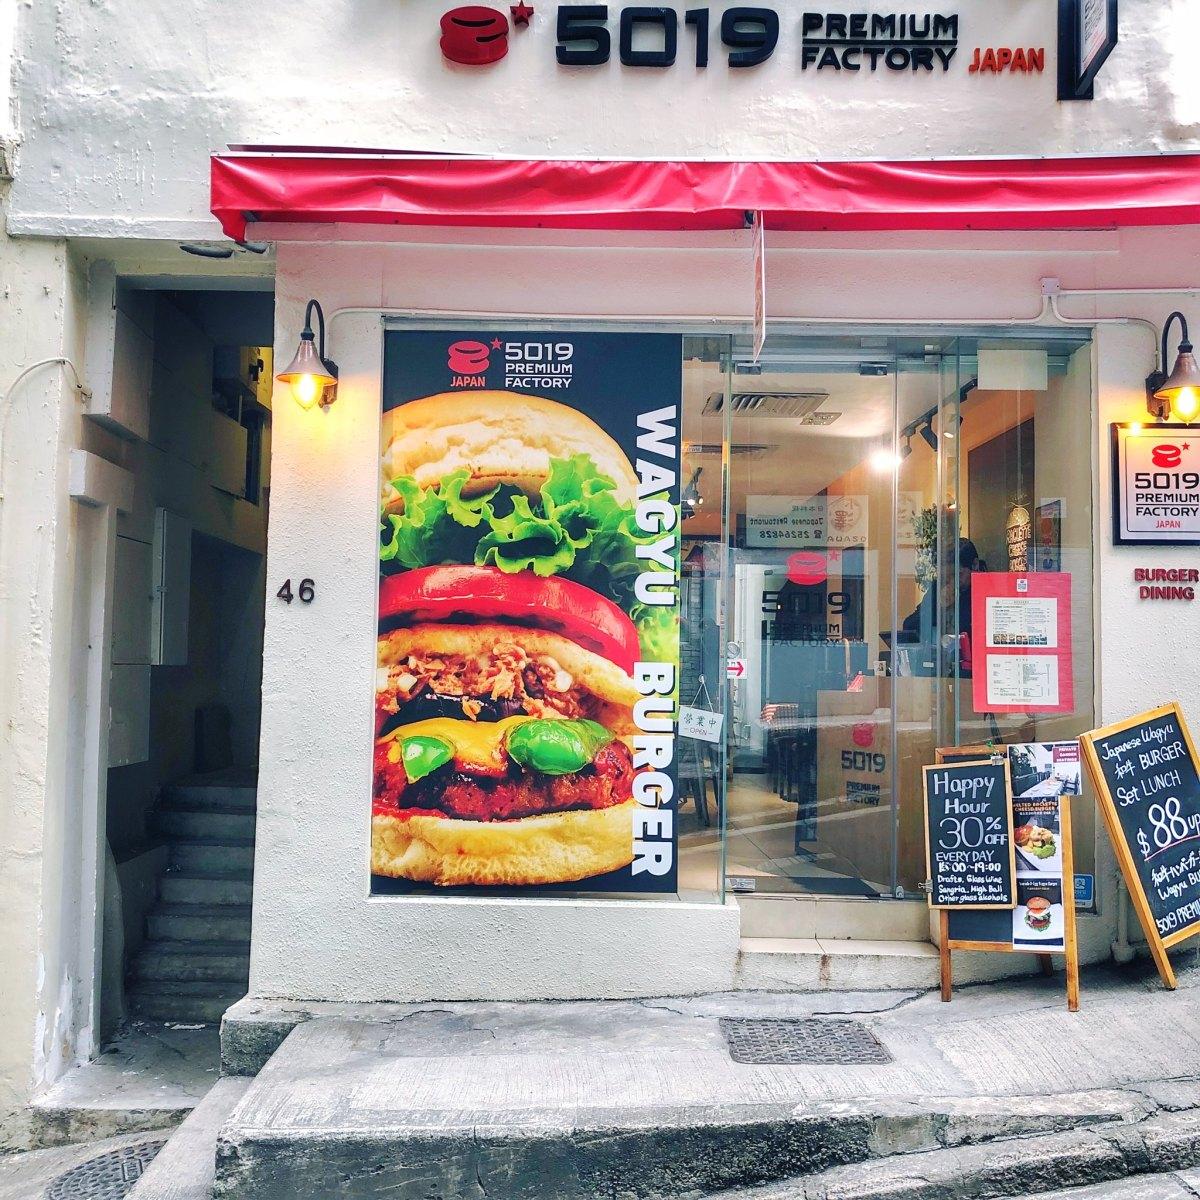 香港 中環蘇豪 soho 區 5019 Premium Factory